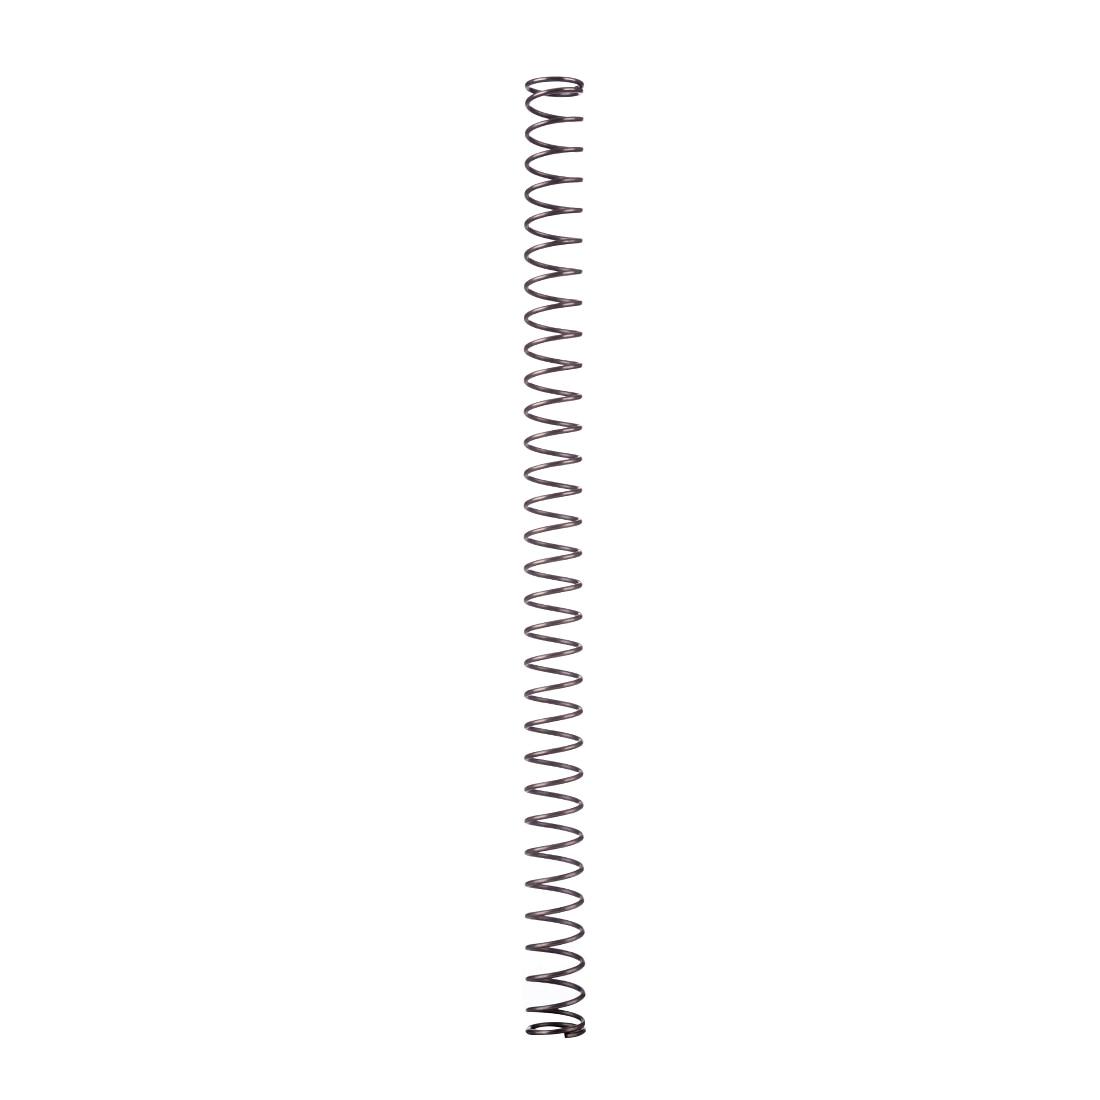 Modiker 6 Sizes 1.8*13.8*220*32 Laps High Strength Spring For GJ M24 Water Gel Beads Blaster - Silver Black